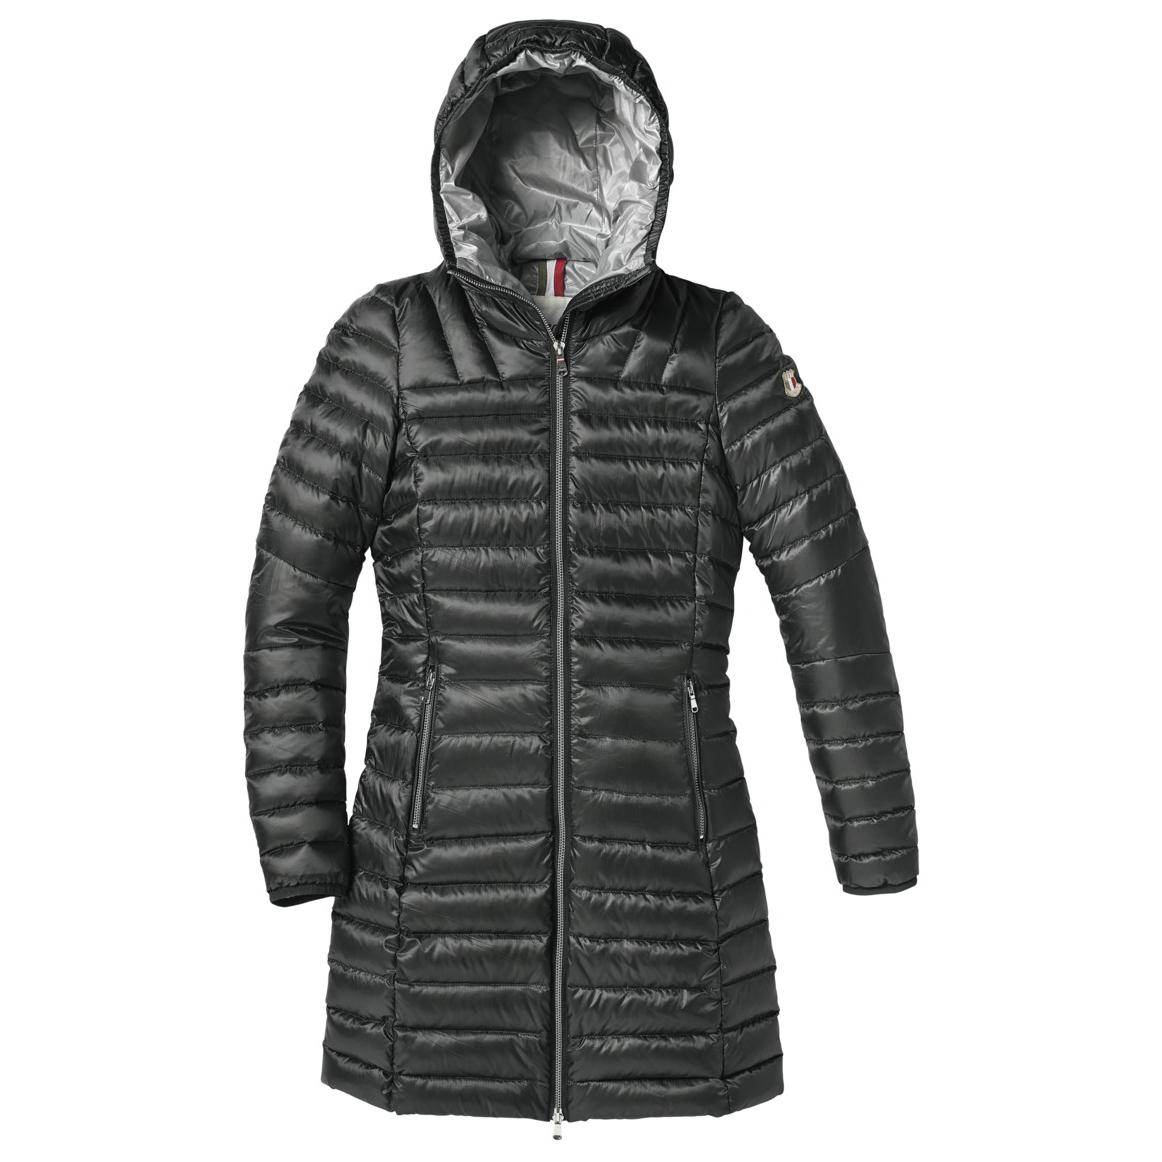 Gratuite Livraison Dolomite Jacket Wj Manteau Corvara Femme qAq8vpxw